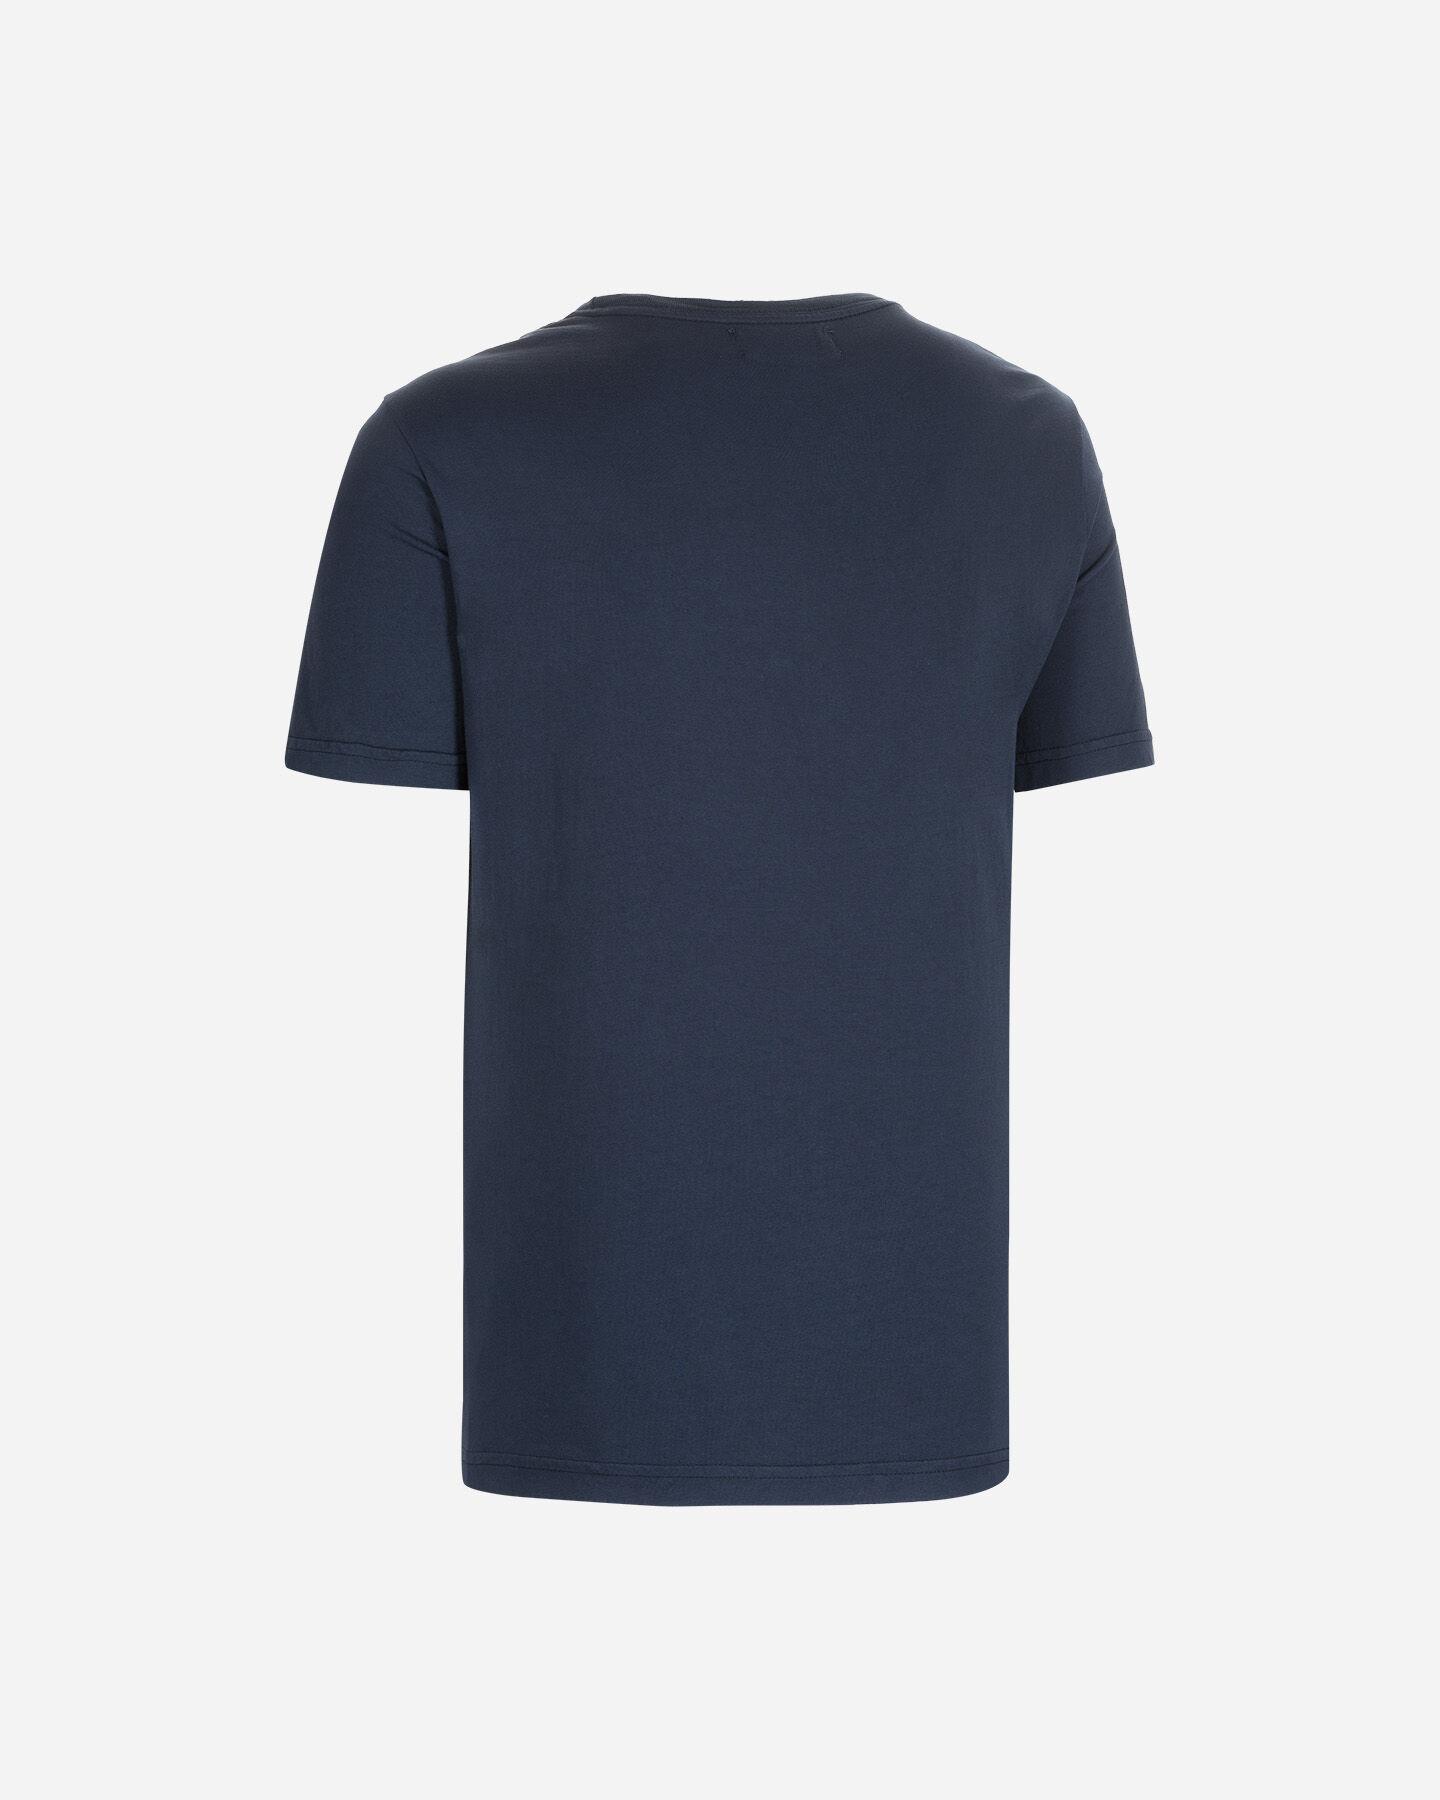 T-Shirt CONVERSE LOGO MINIMAL M S5246608 scatto 1